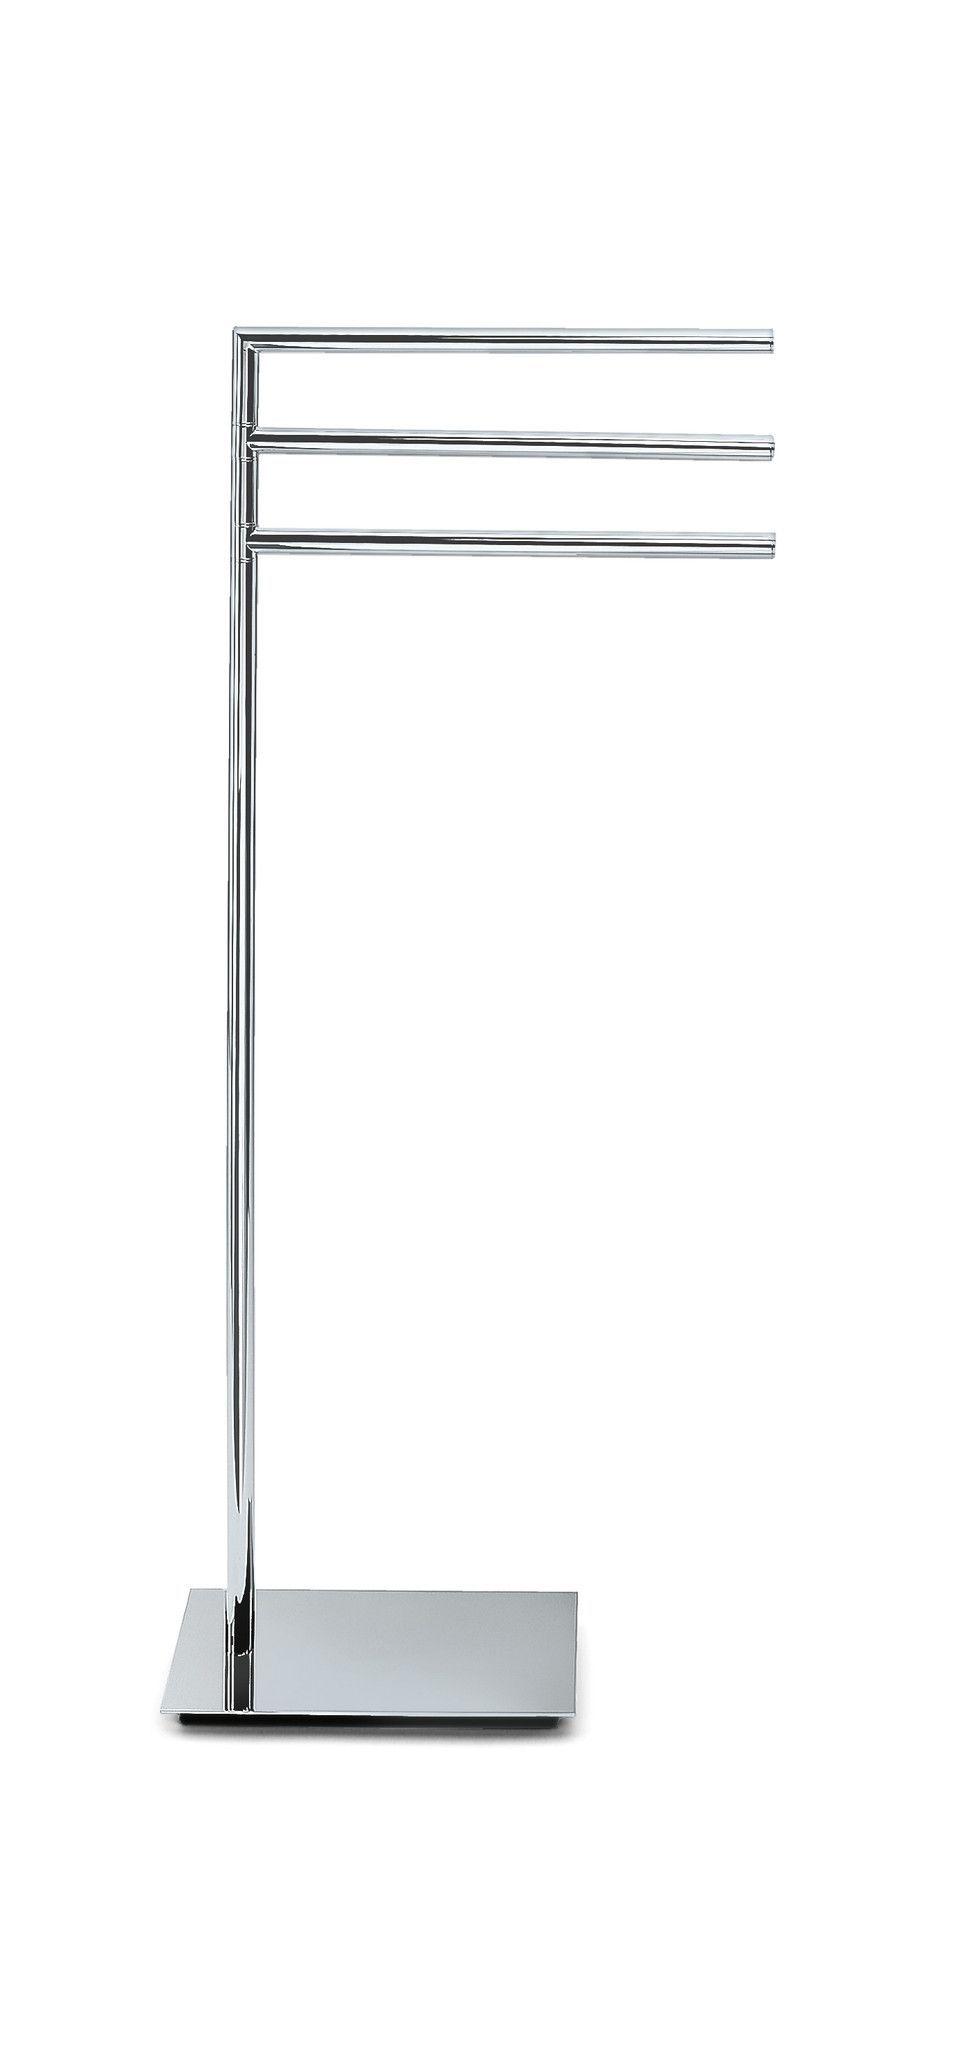 Dwba Standing Towel Rack Stand Bar Towel Holder 3 Tier Triple Bar Holder Chrome Towel Rack Standing Towel Rack Rustic Towel Rack